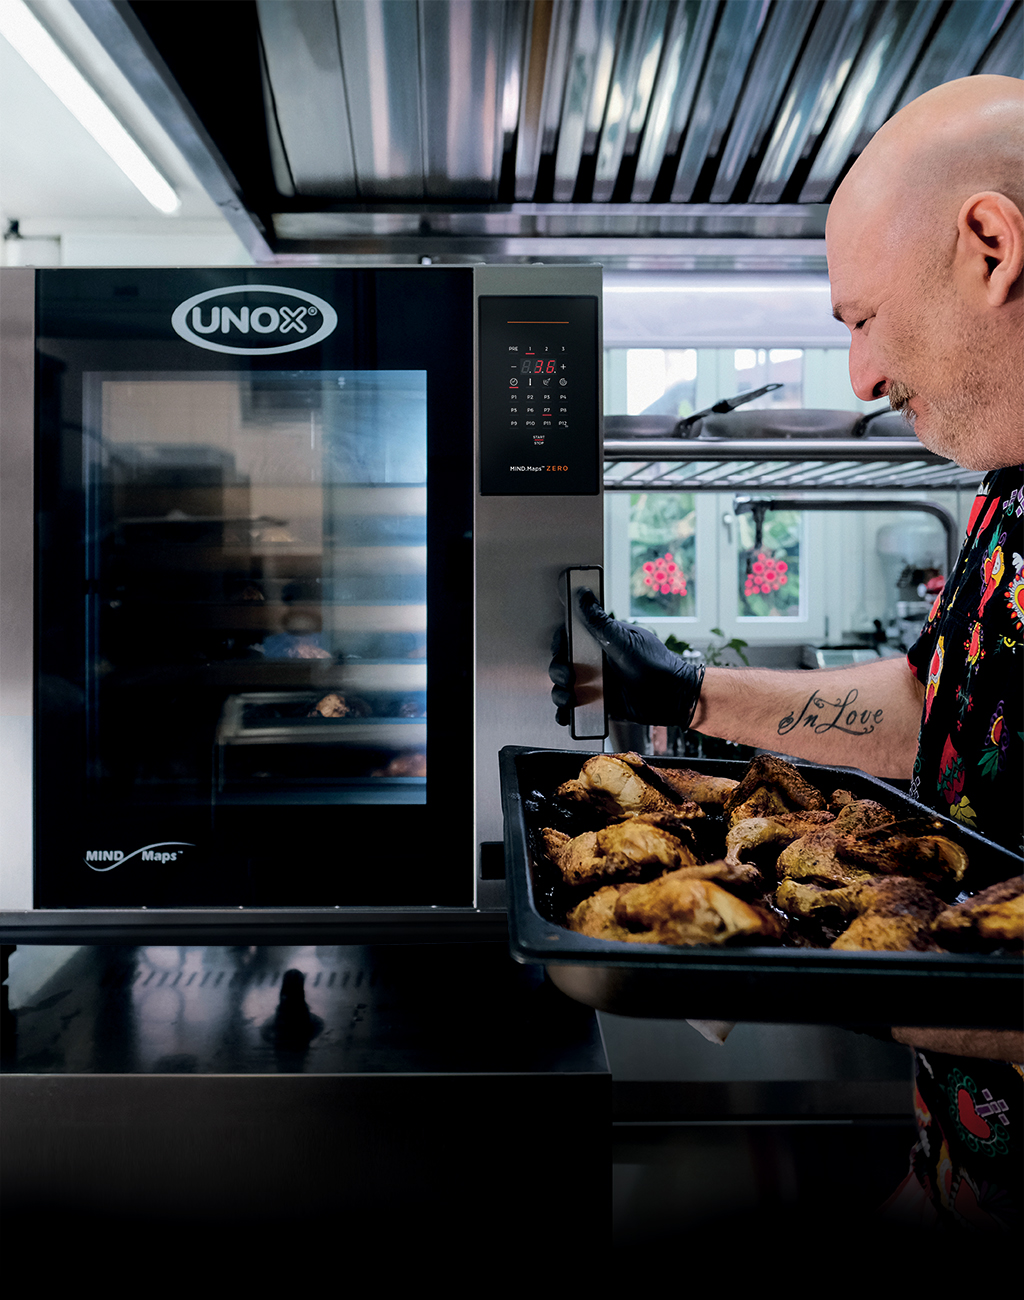 Cuisine select convection oven manual pdf